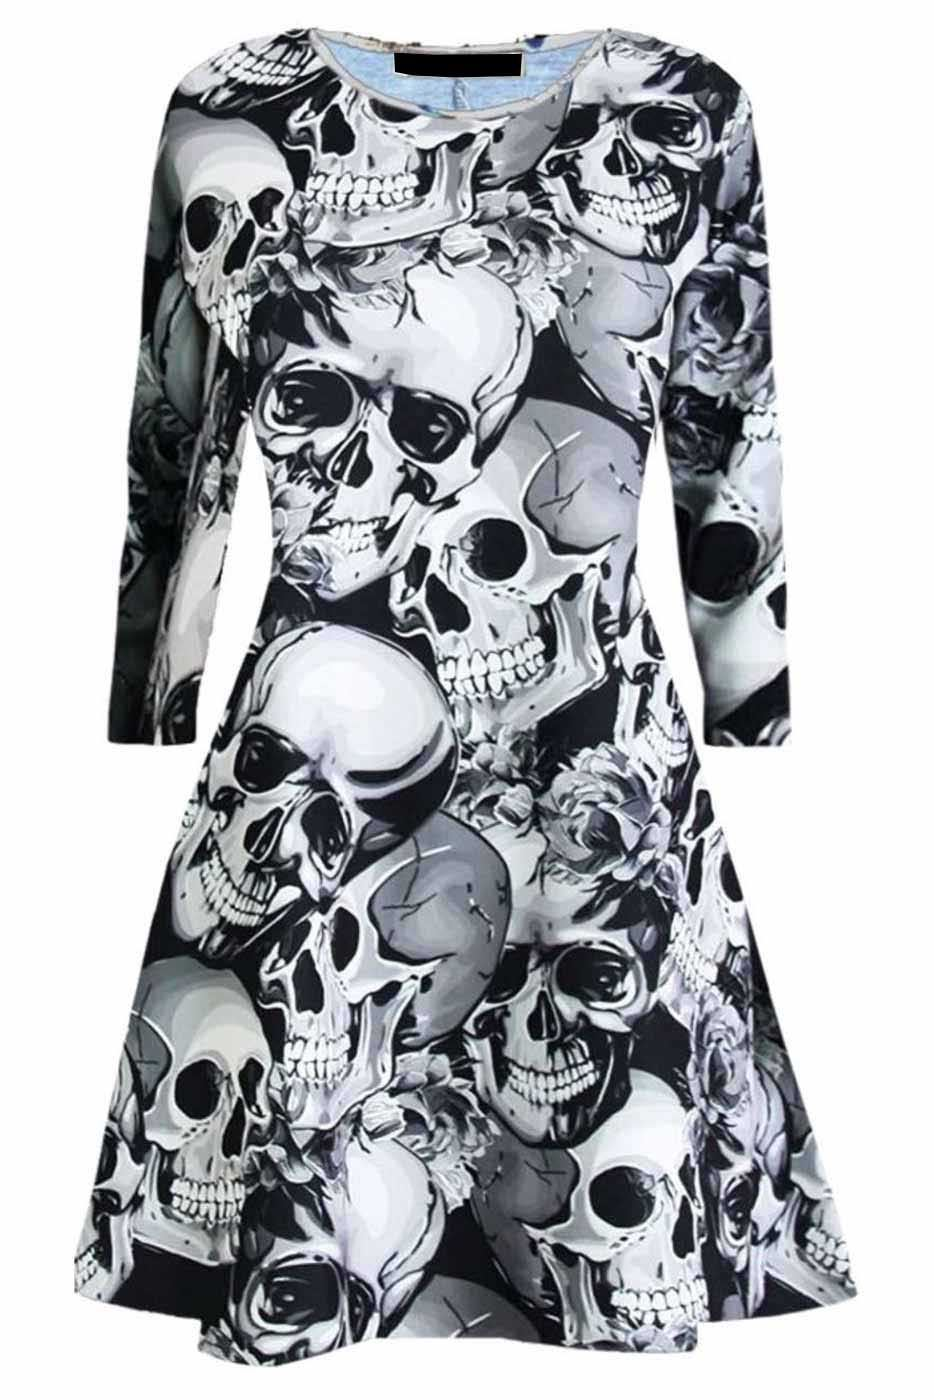 Womens Halloween Tunic Dress Skull Grey Prints Swing Ladies Party Wear Crew Neck